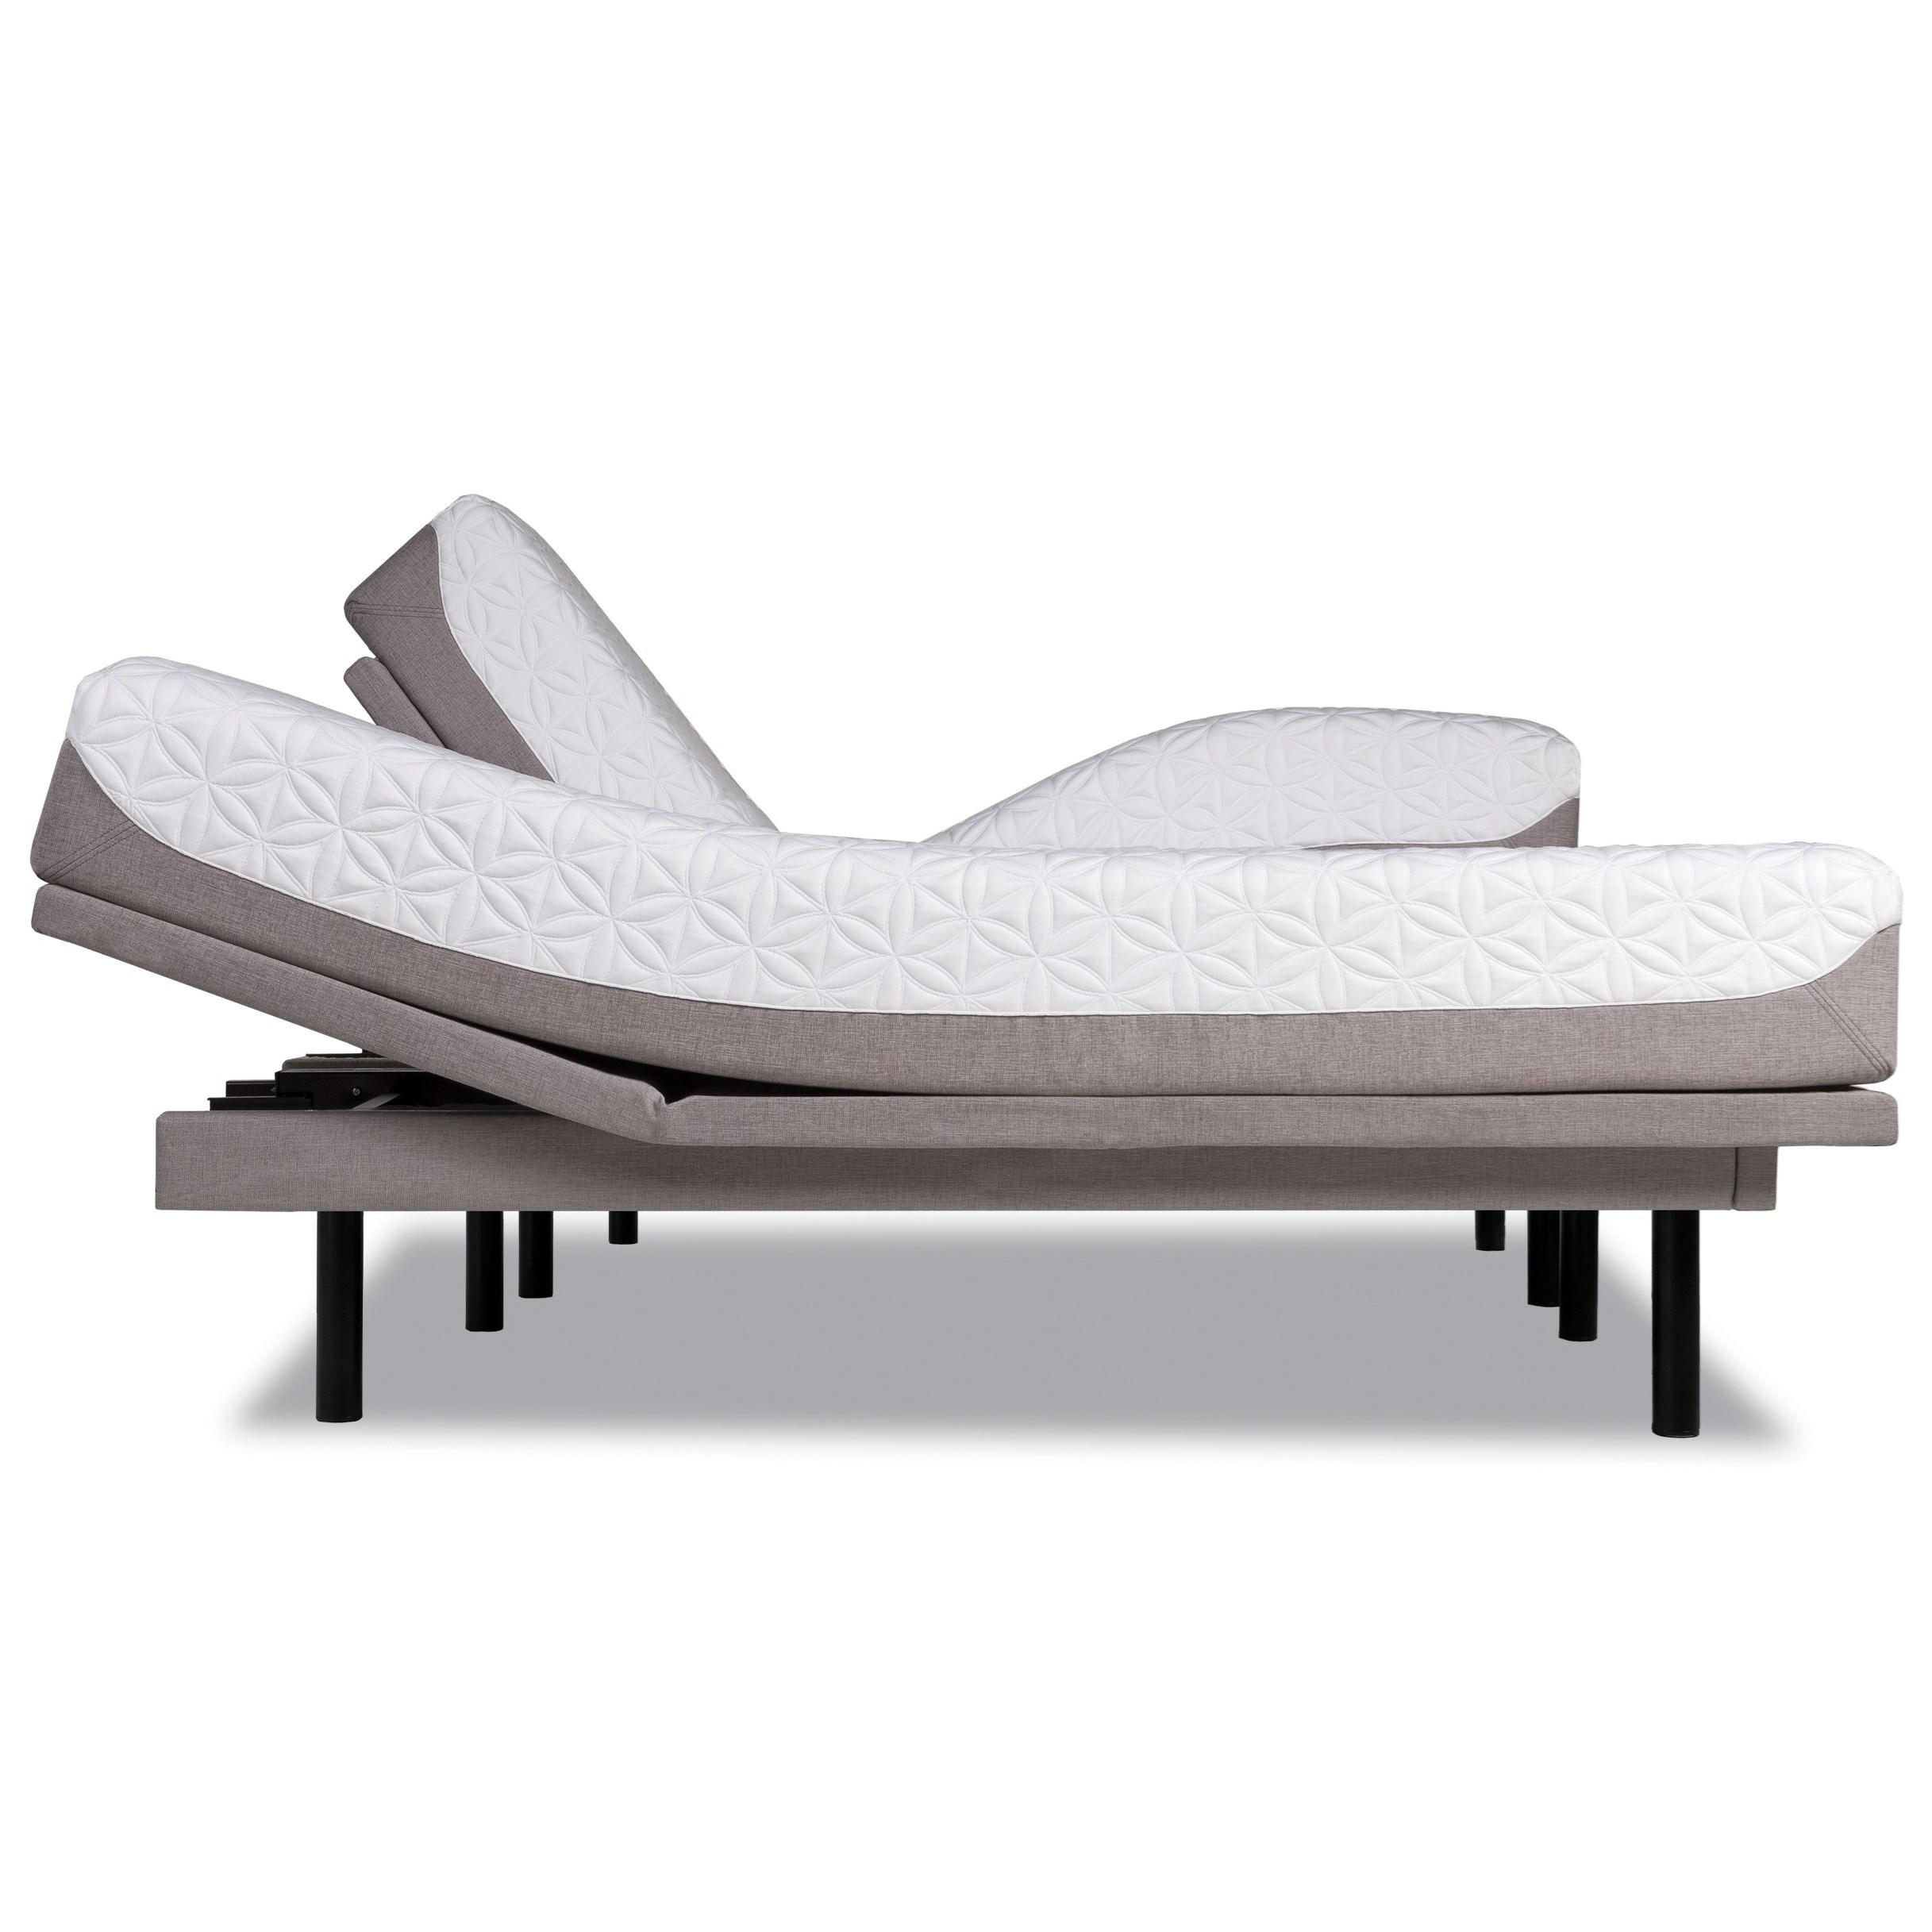 Tempur-Pedic® TEMPUR-Cloud Prima Twin XL Medium-Soft Mattress Set - Item Number: 10237120+25289220